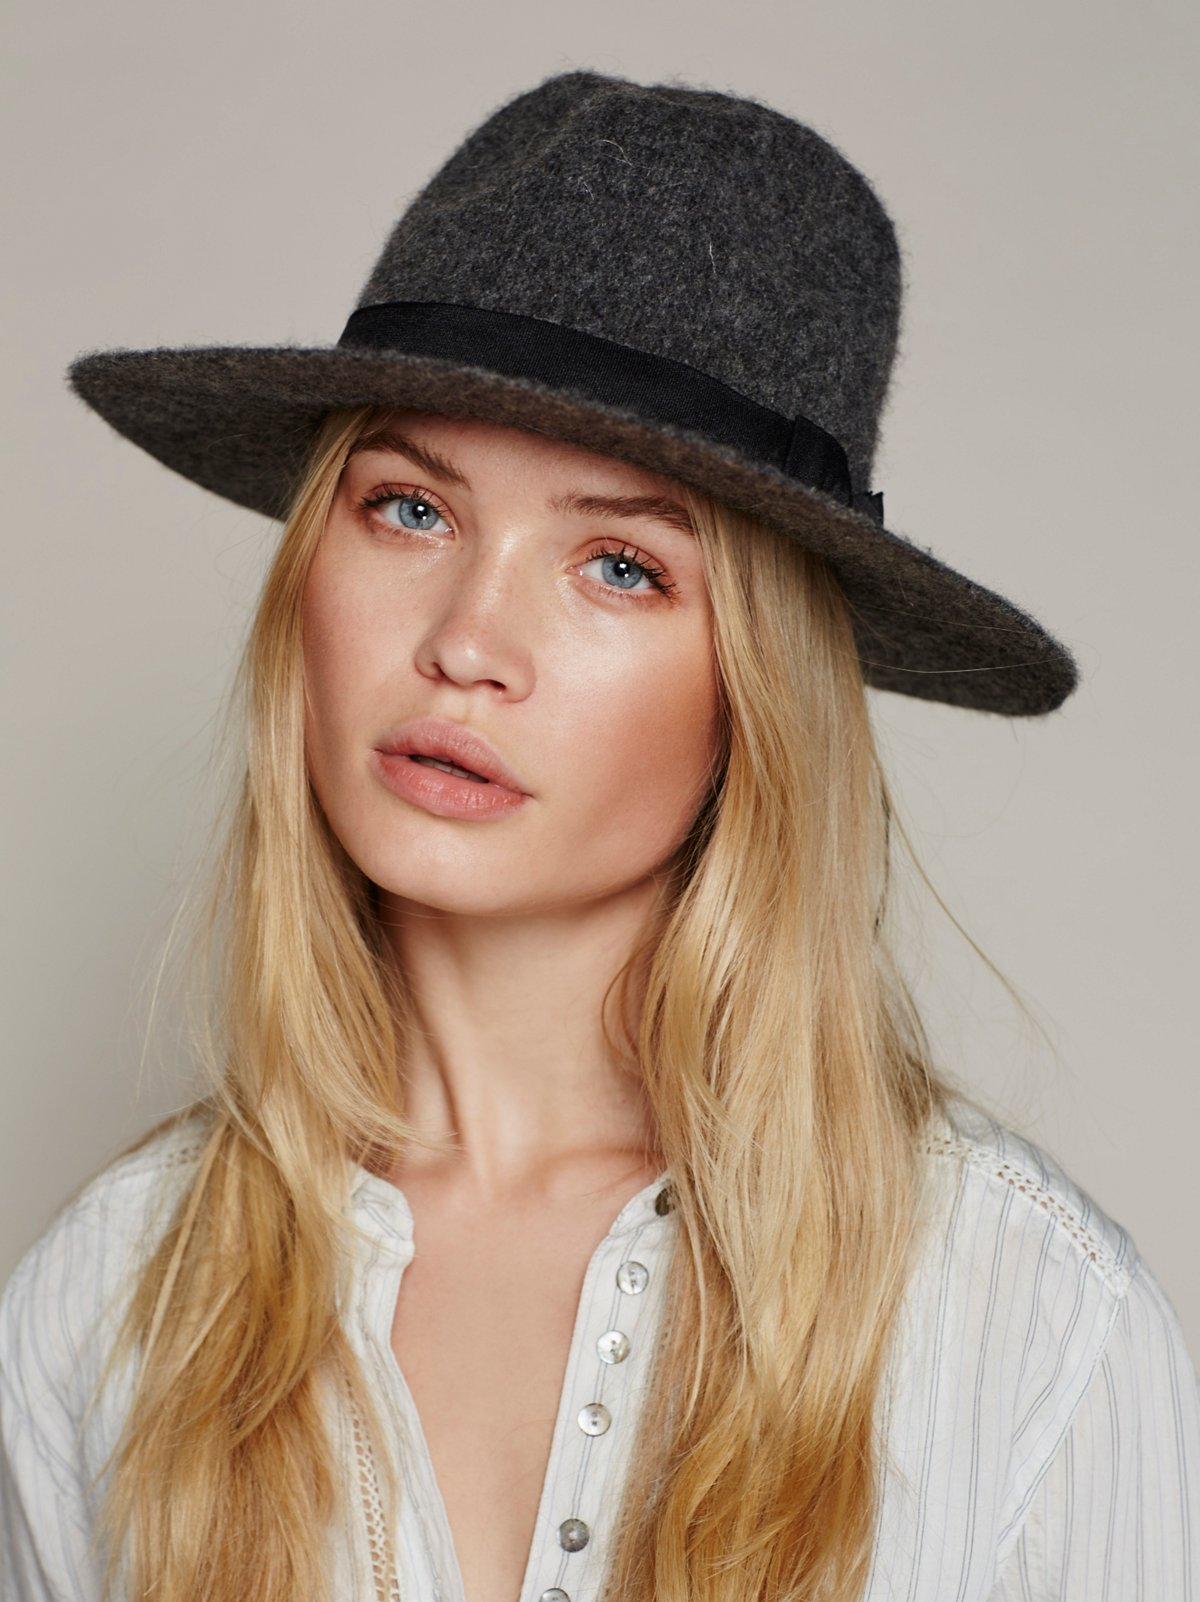 Easy Street帽子